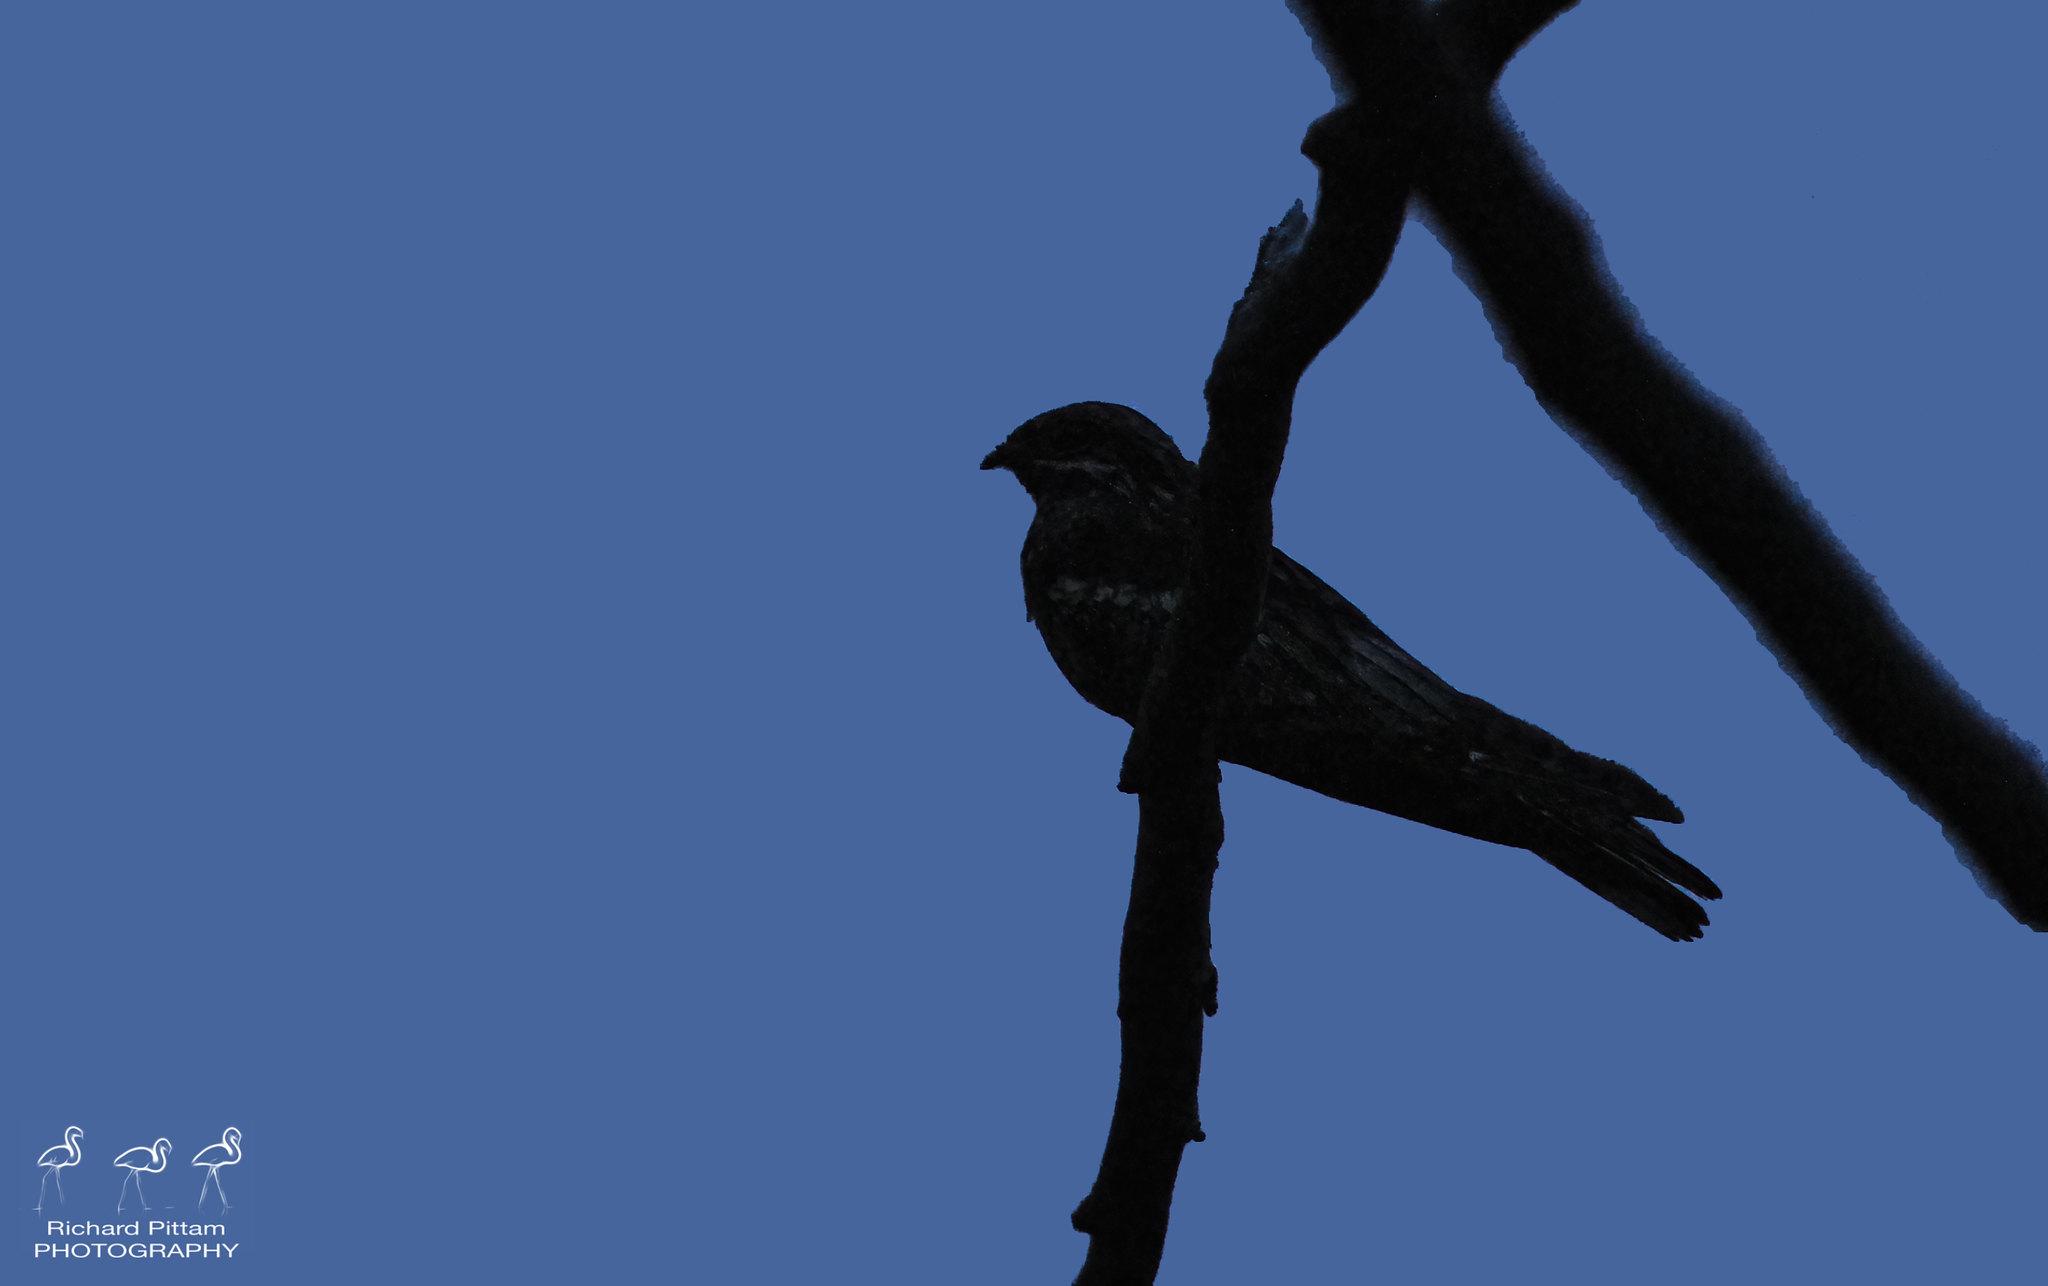 Nightjar - it's difficult shooting in the dark, at a dark subject....god those midges :-(